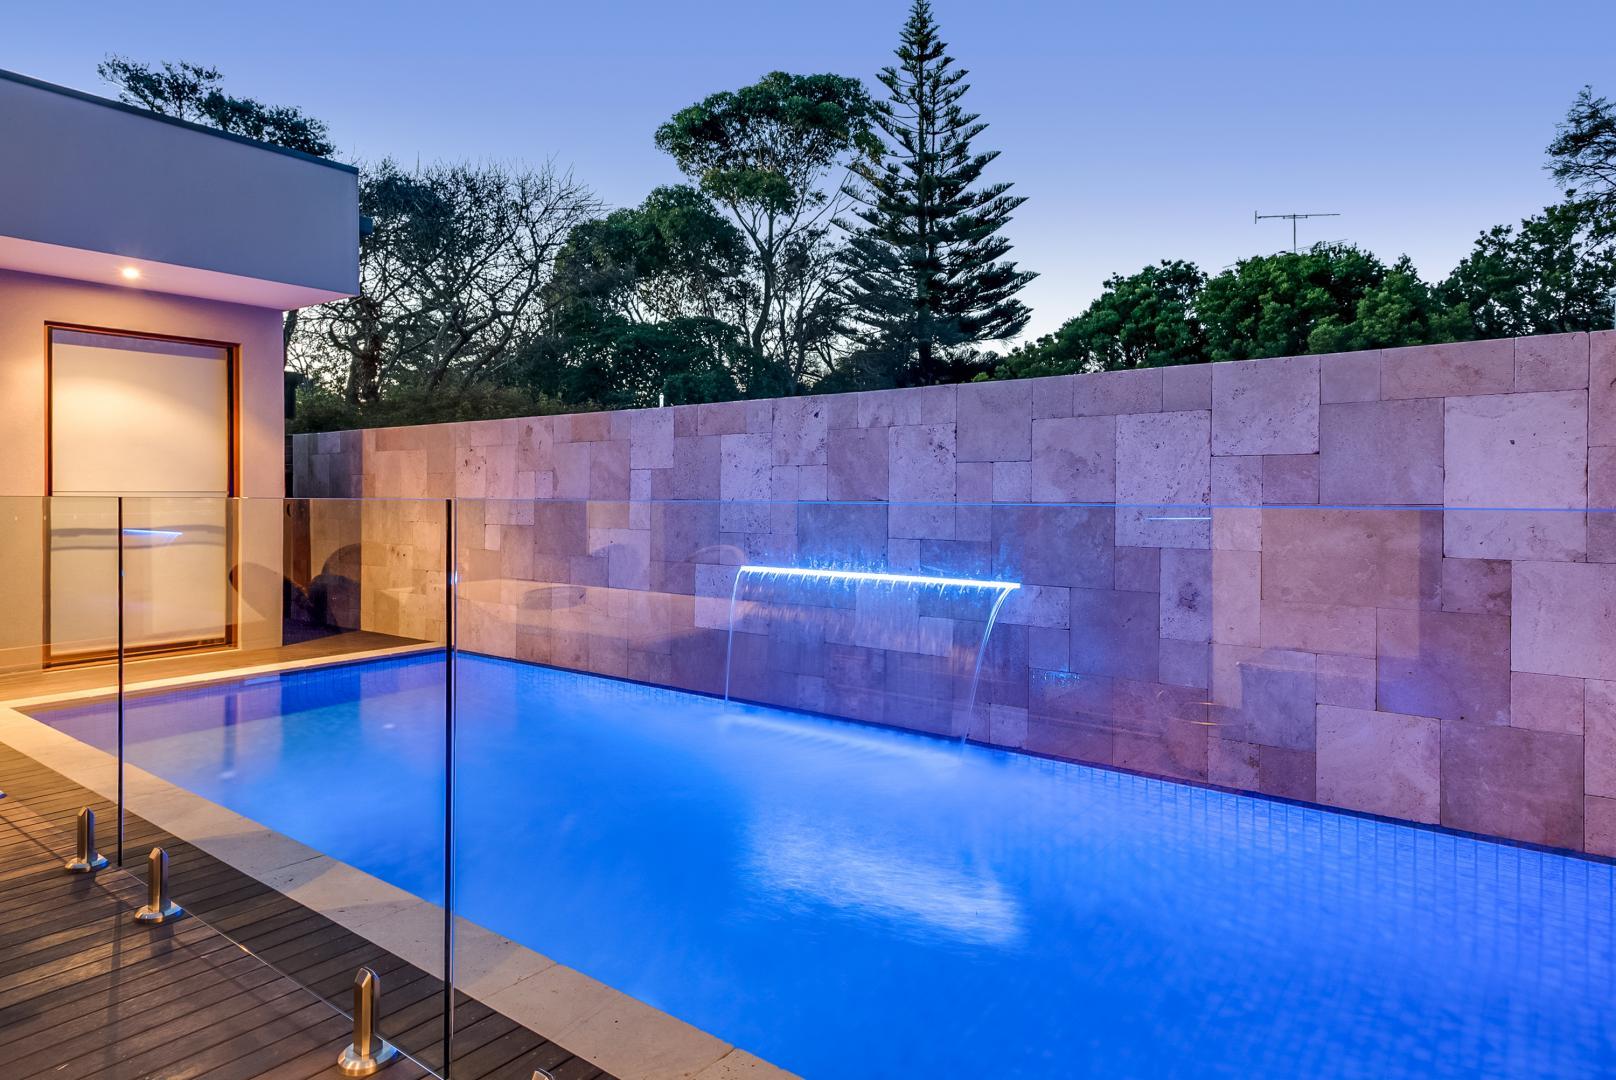 Pool builders, Mornington Peninsula, Rosebud, Melbourne ...